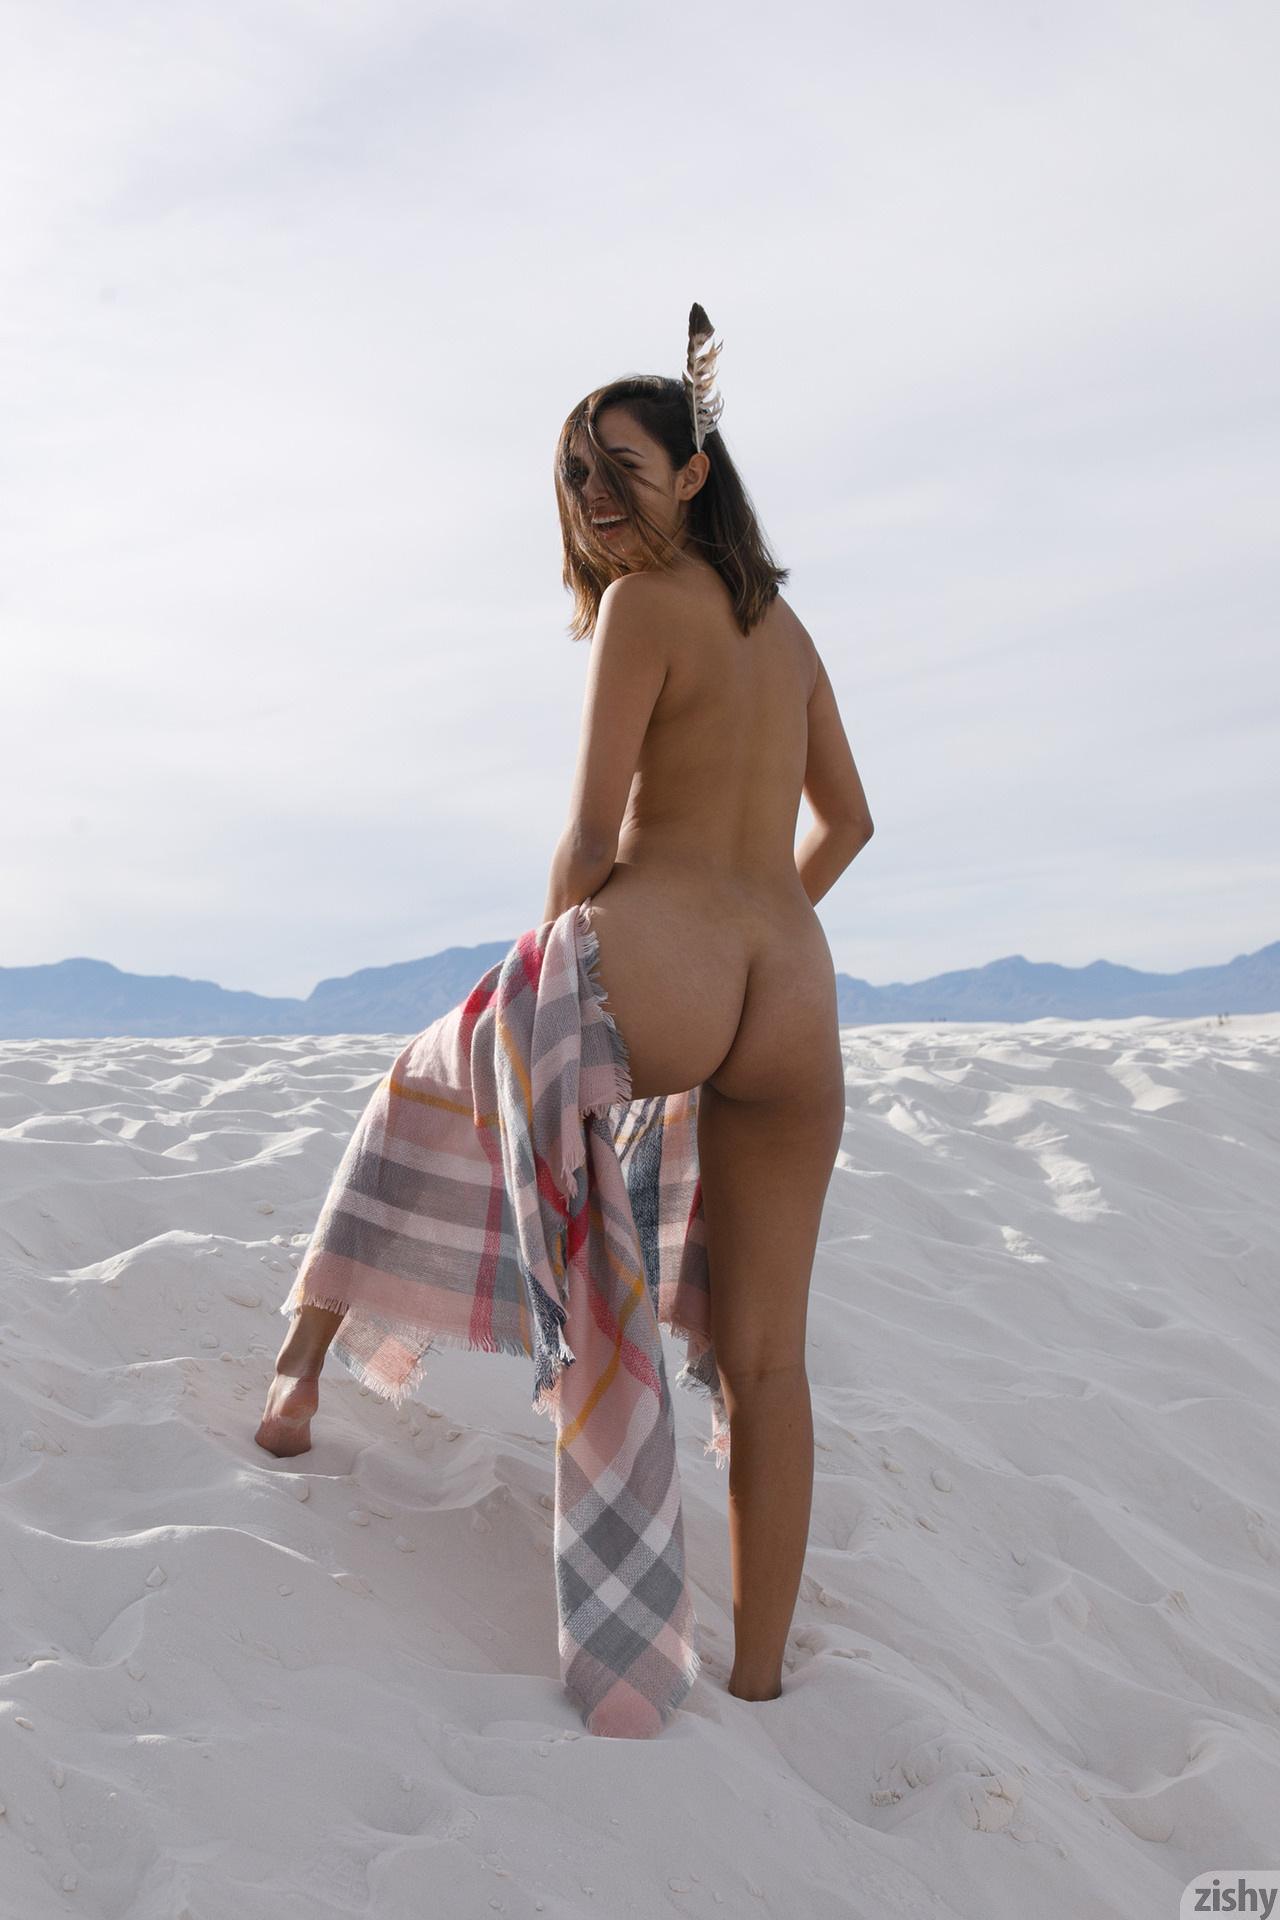 Alejandra Cobos White Sands 3 Zishy (7)